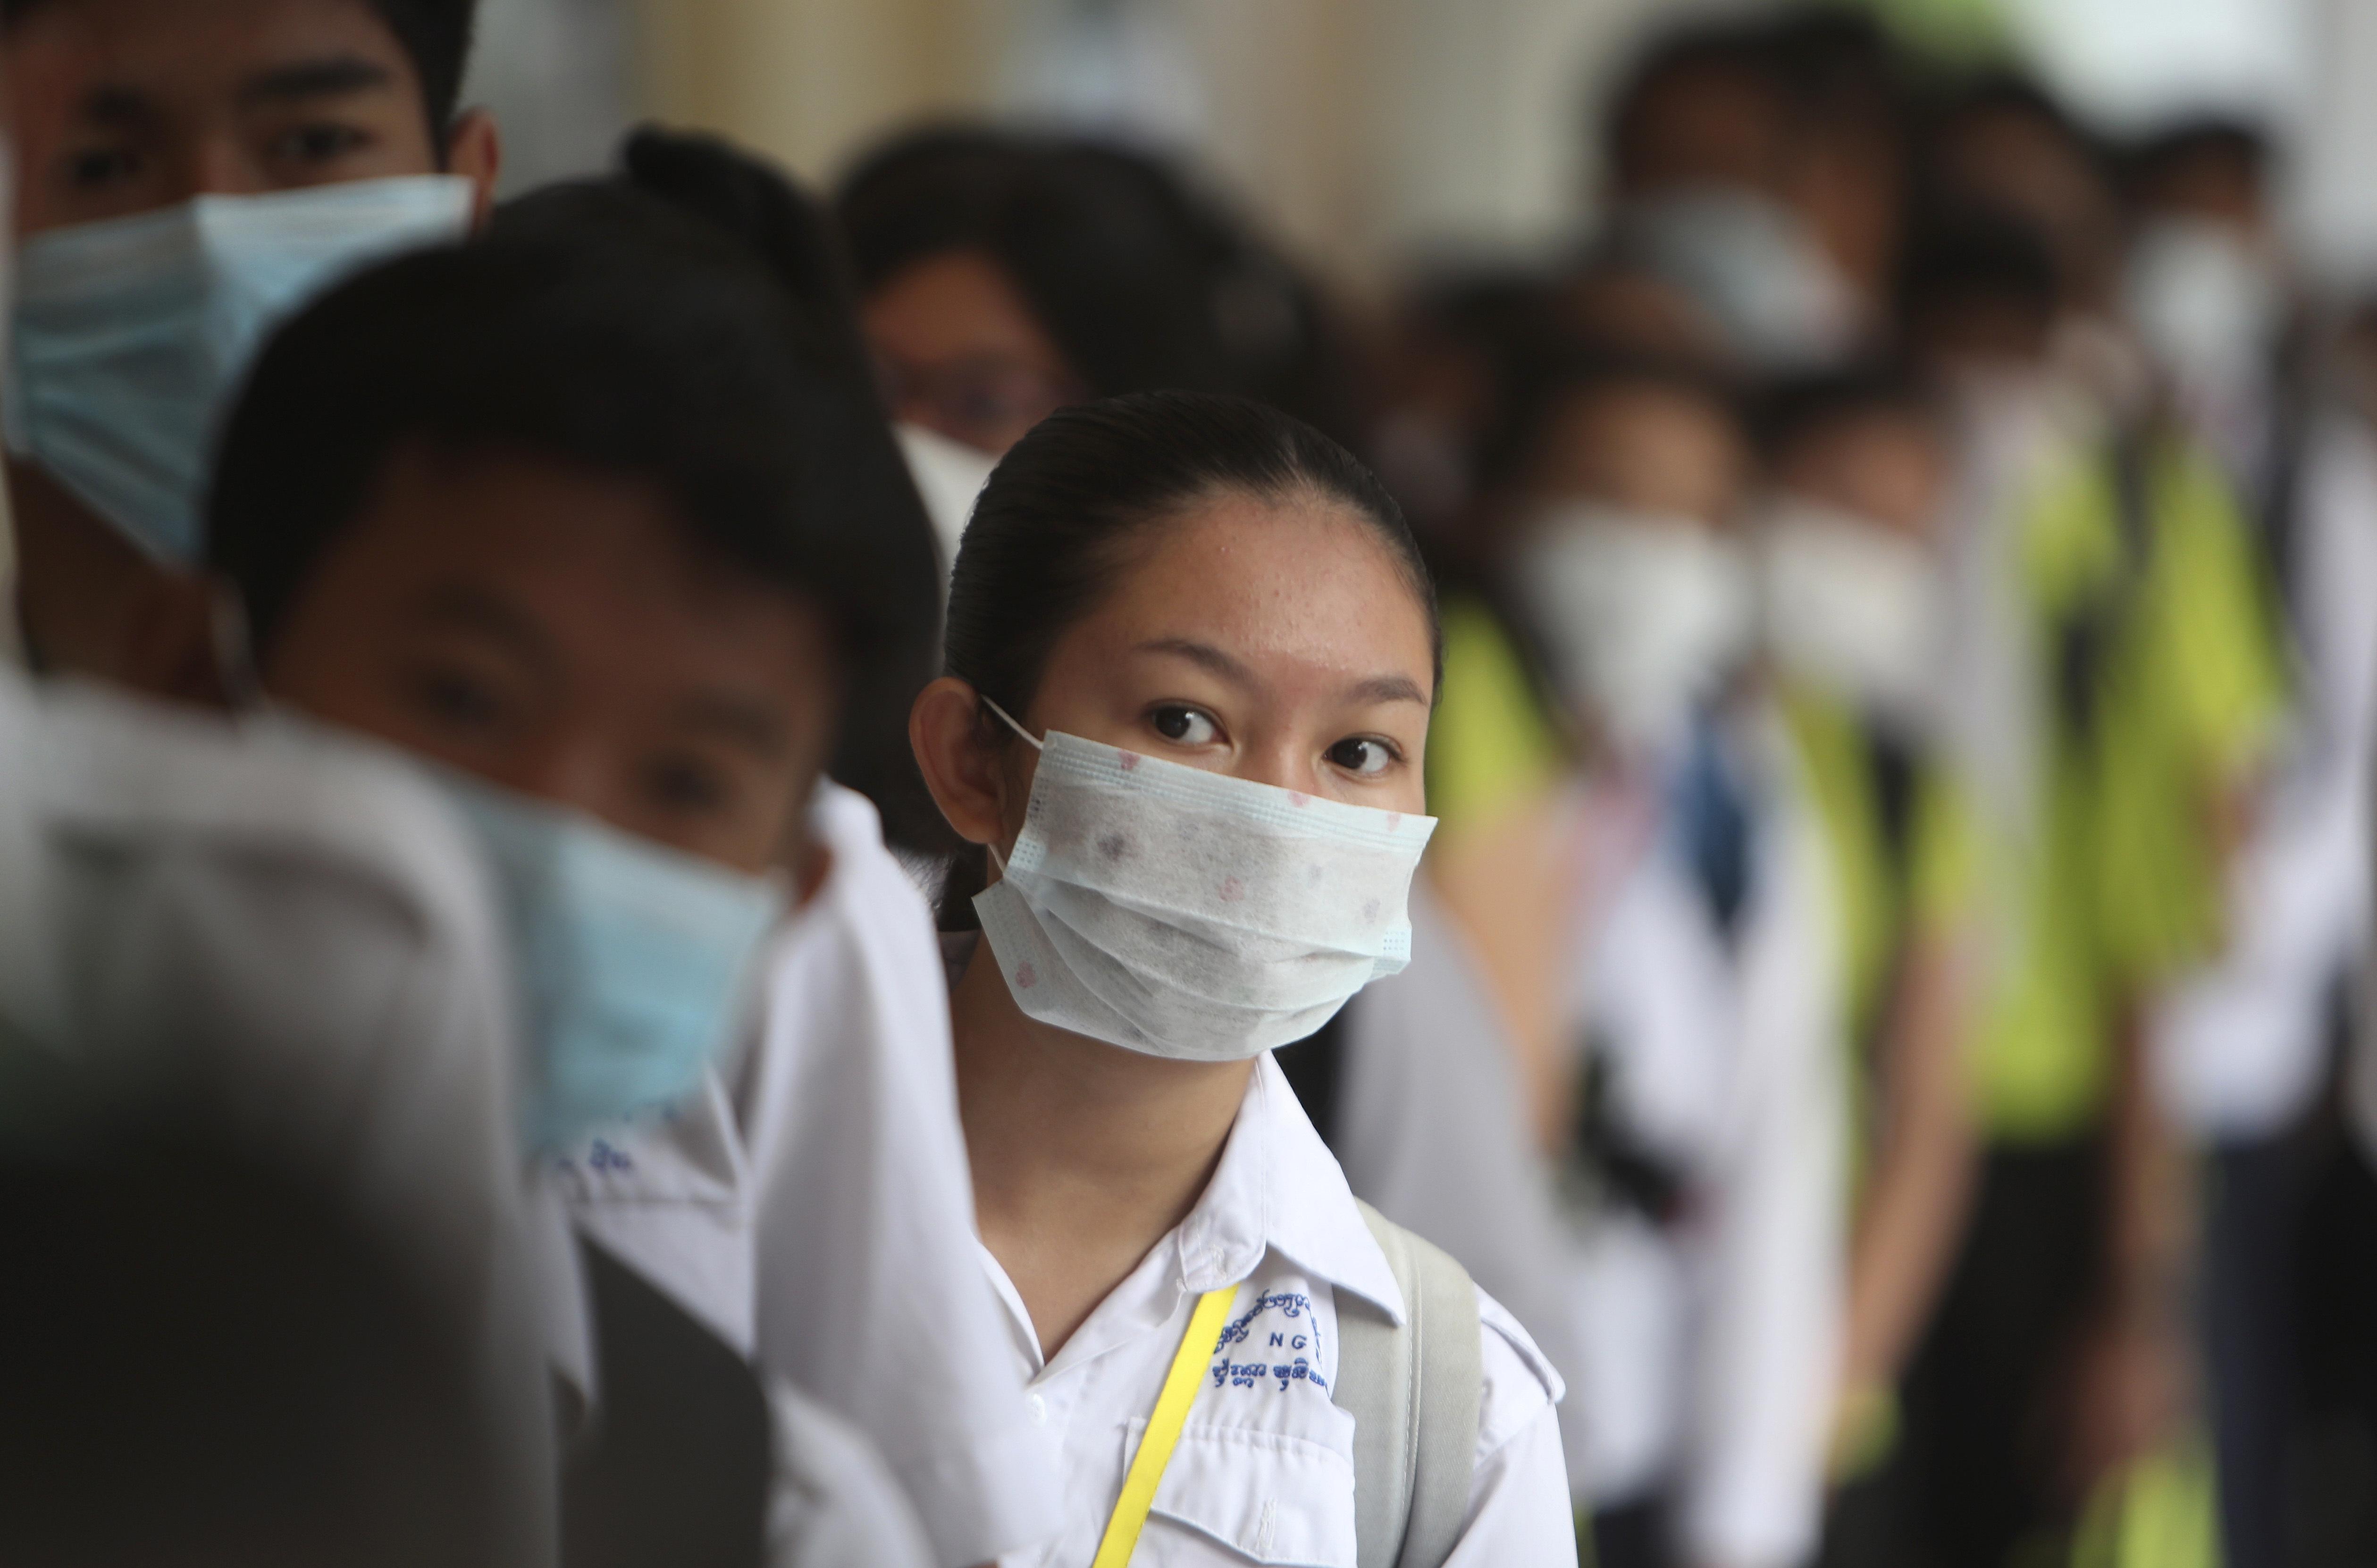 World Health Organization considers global emergency declaration as death toll hits 170